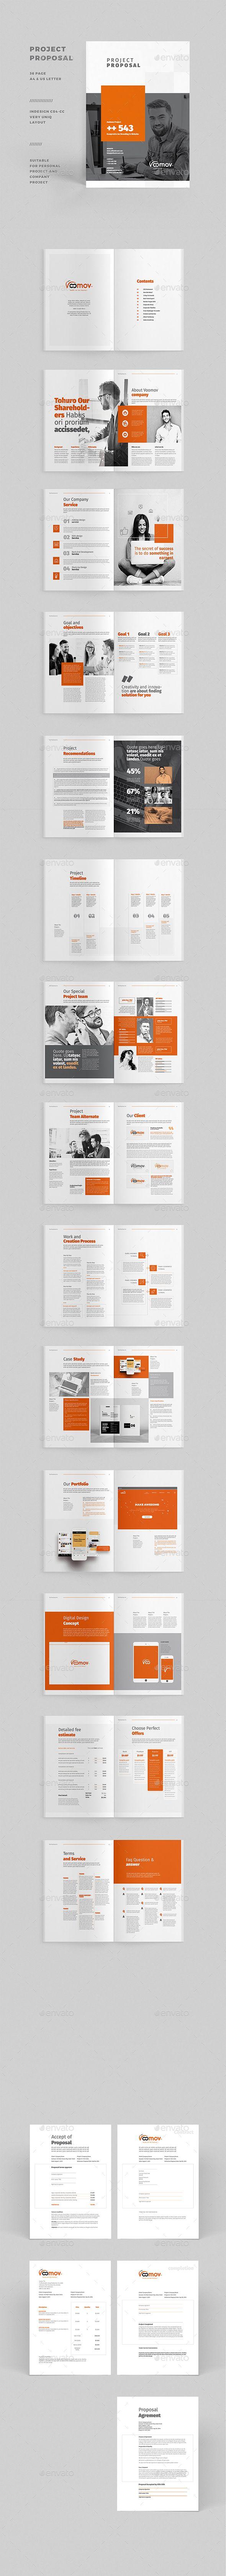 Proposal - Corporate Brochures Download here : https://graphicriver.net/item/proposal/18906953?s_rank=130&ref=Al-fatih